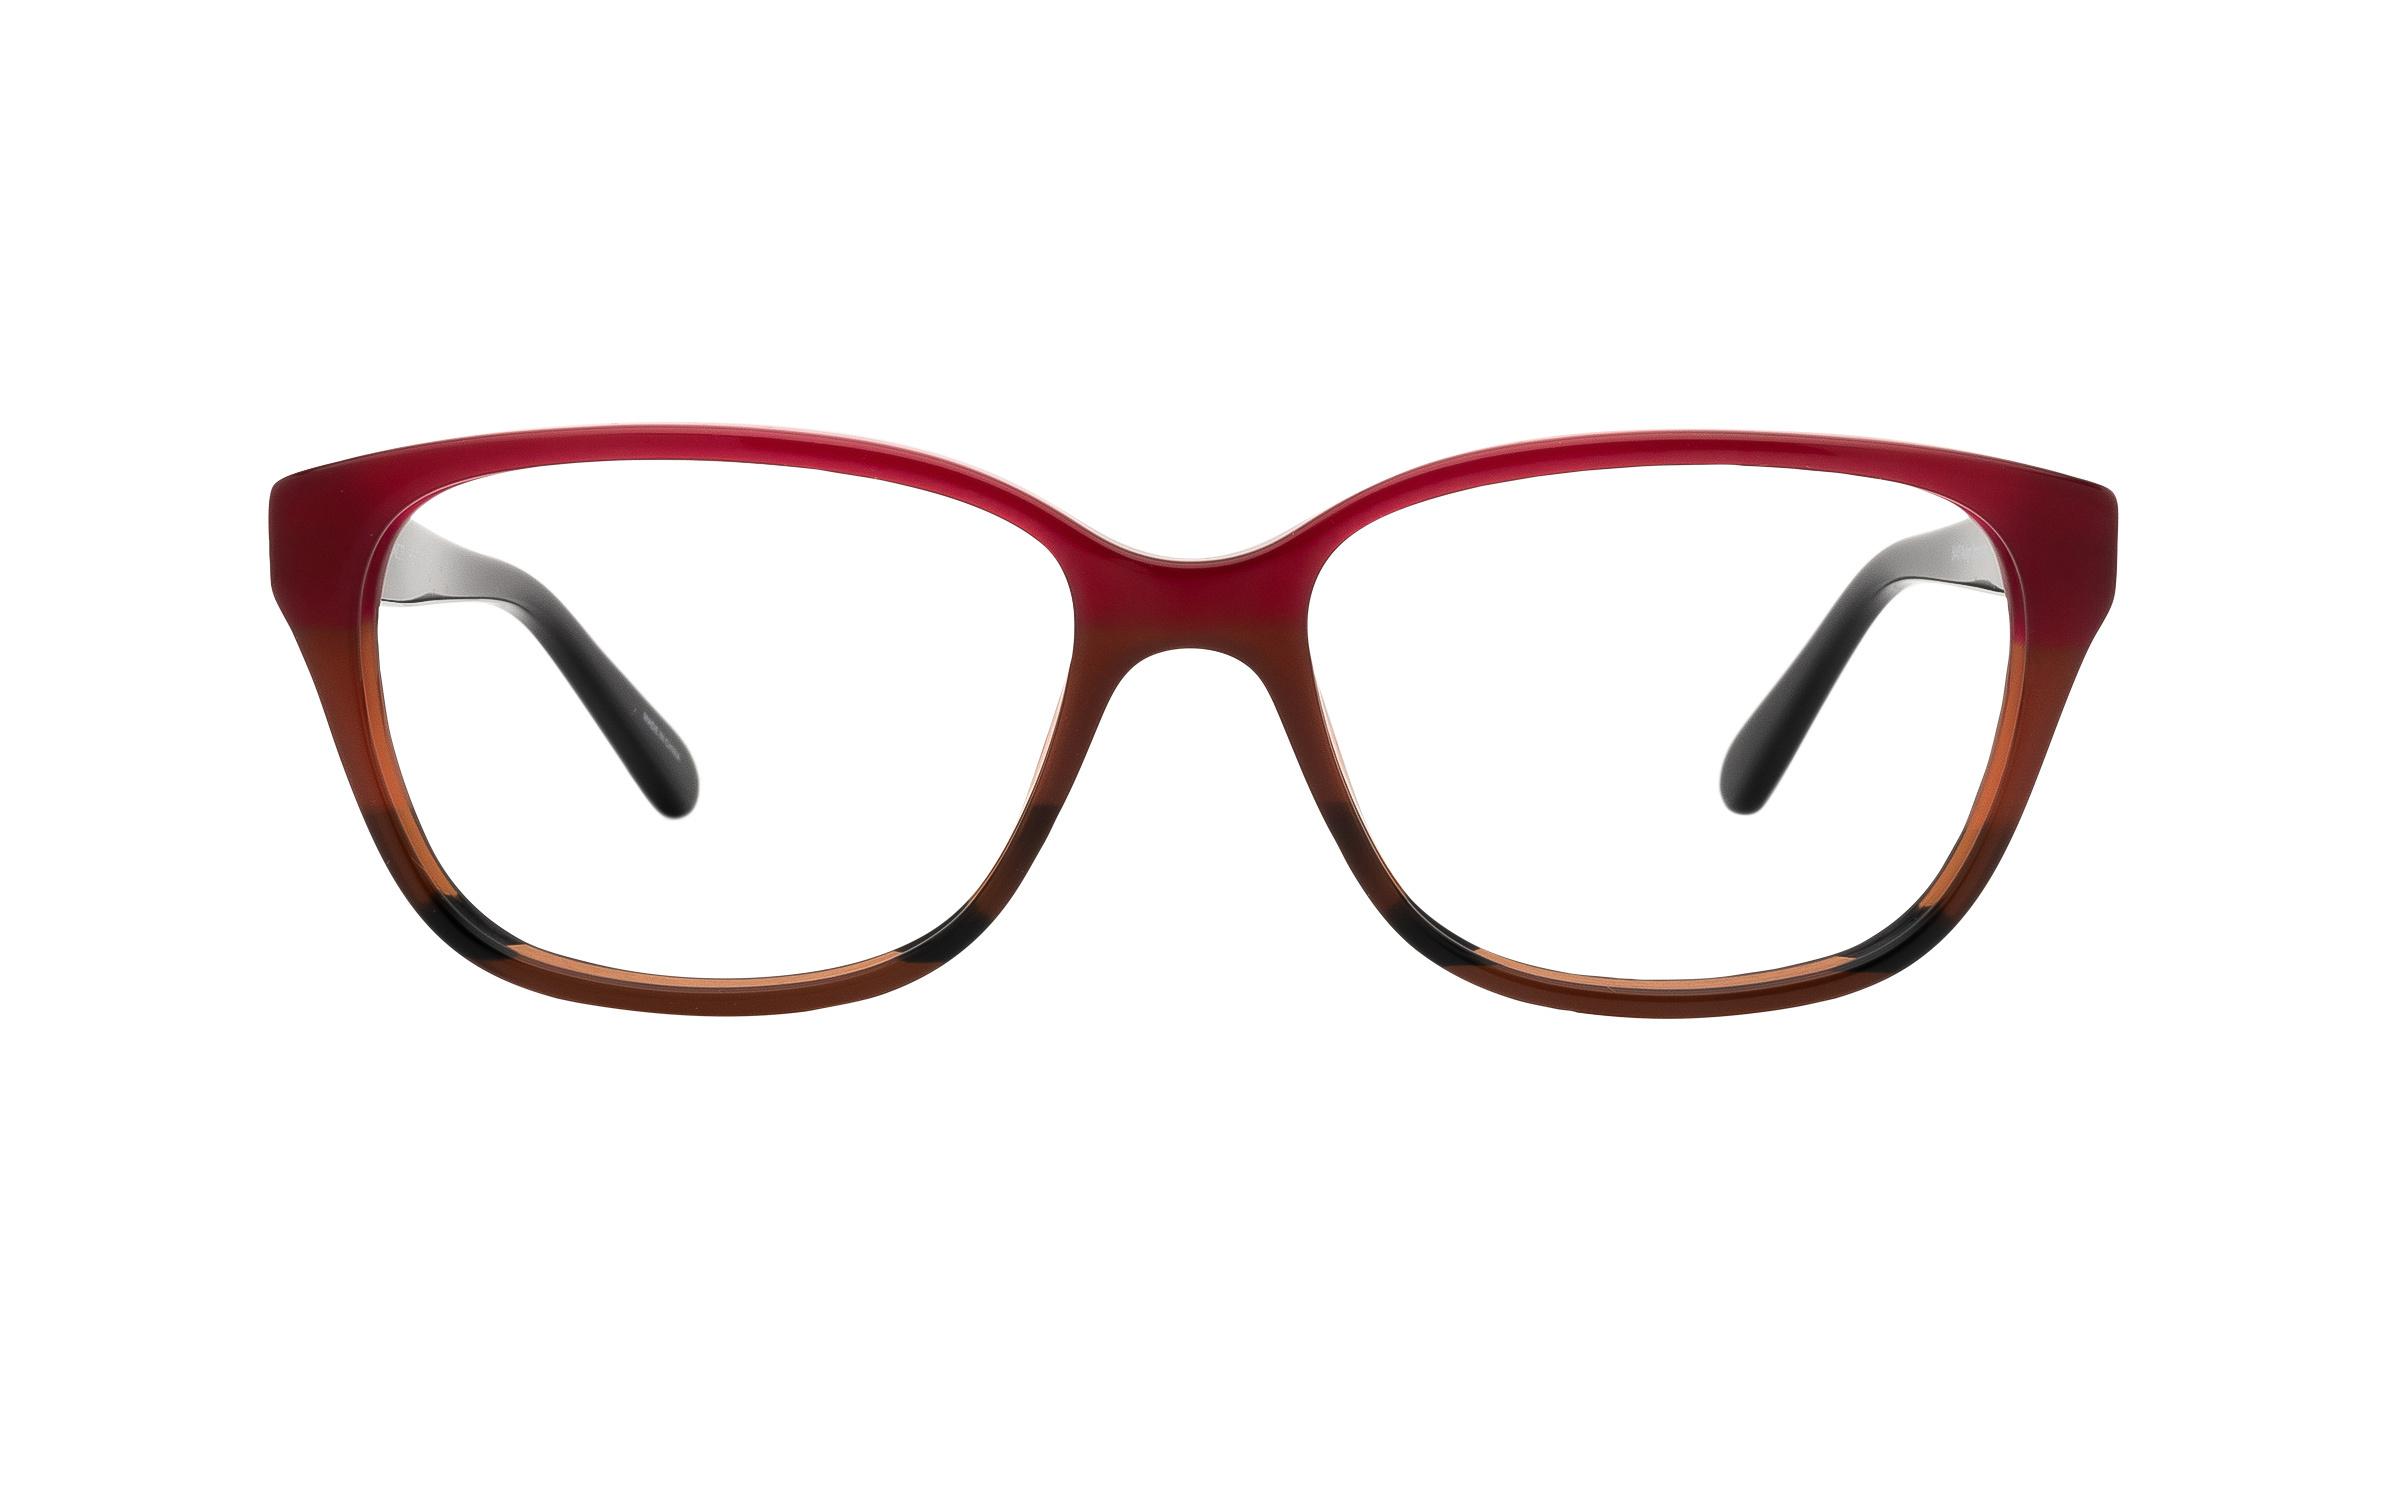 coastal.com - Coach HC6103 5445 (54) Eyeglasses and Frame in Aubgn Cognac Varsity Stripe Brown/Red – Online Coastal 191.00 USD